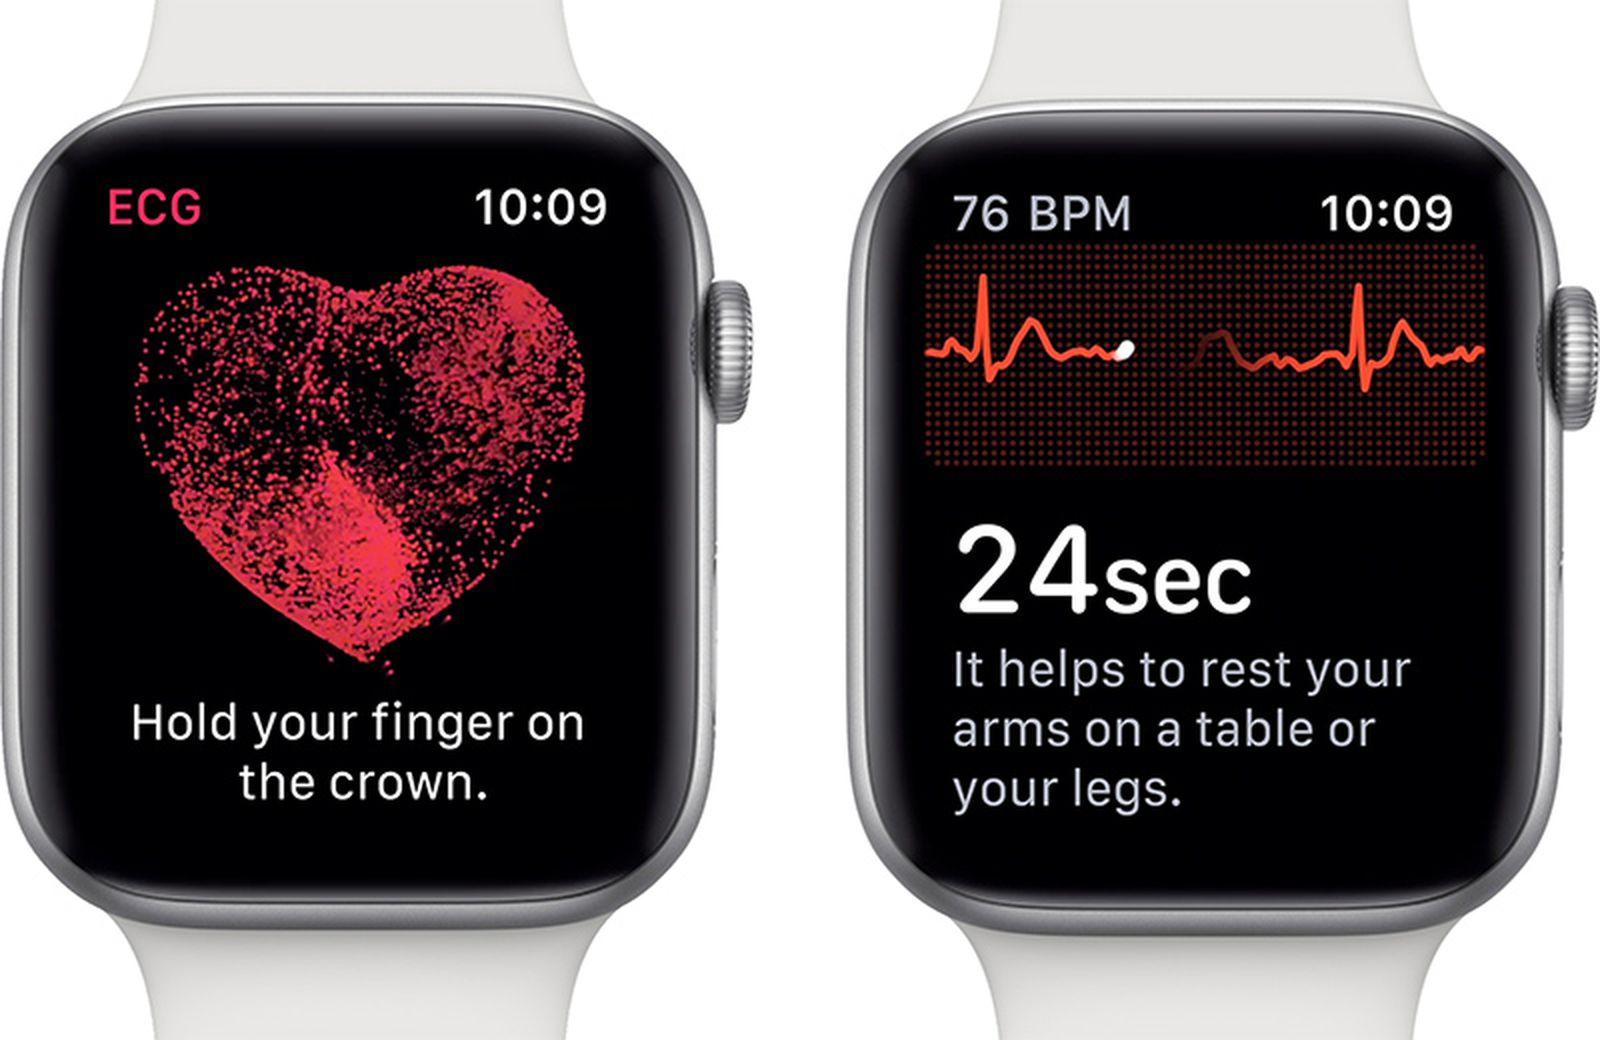 Apple Watch Series 4's ECG Feature Will Work Internationally When Set to U.S. Region - MacRumors